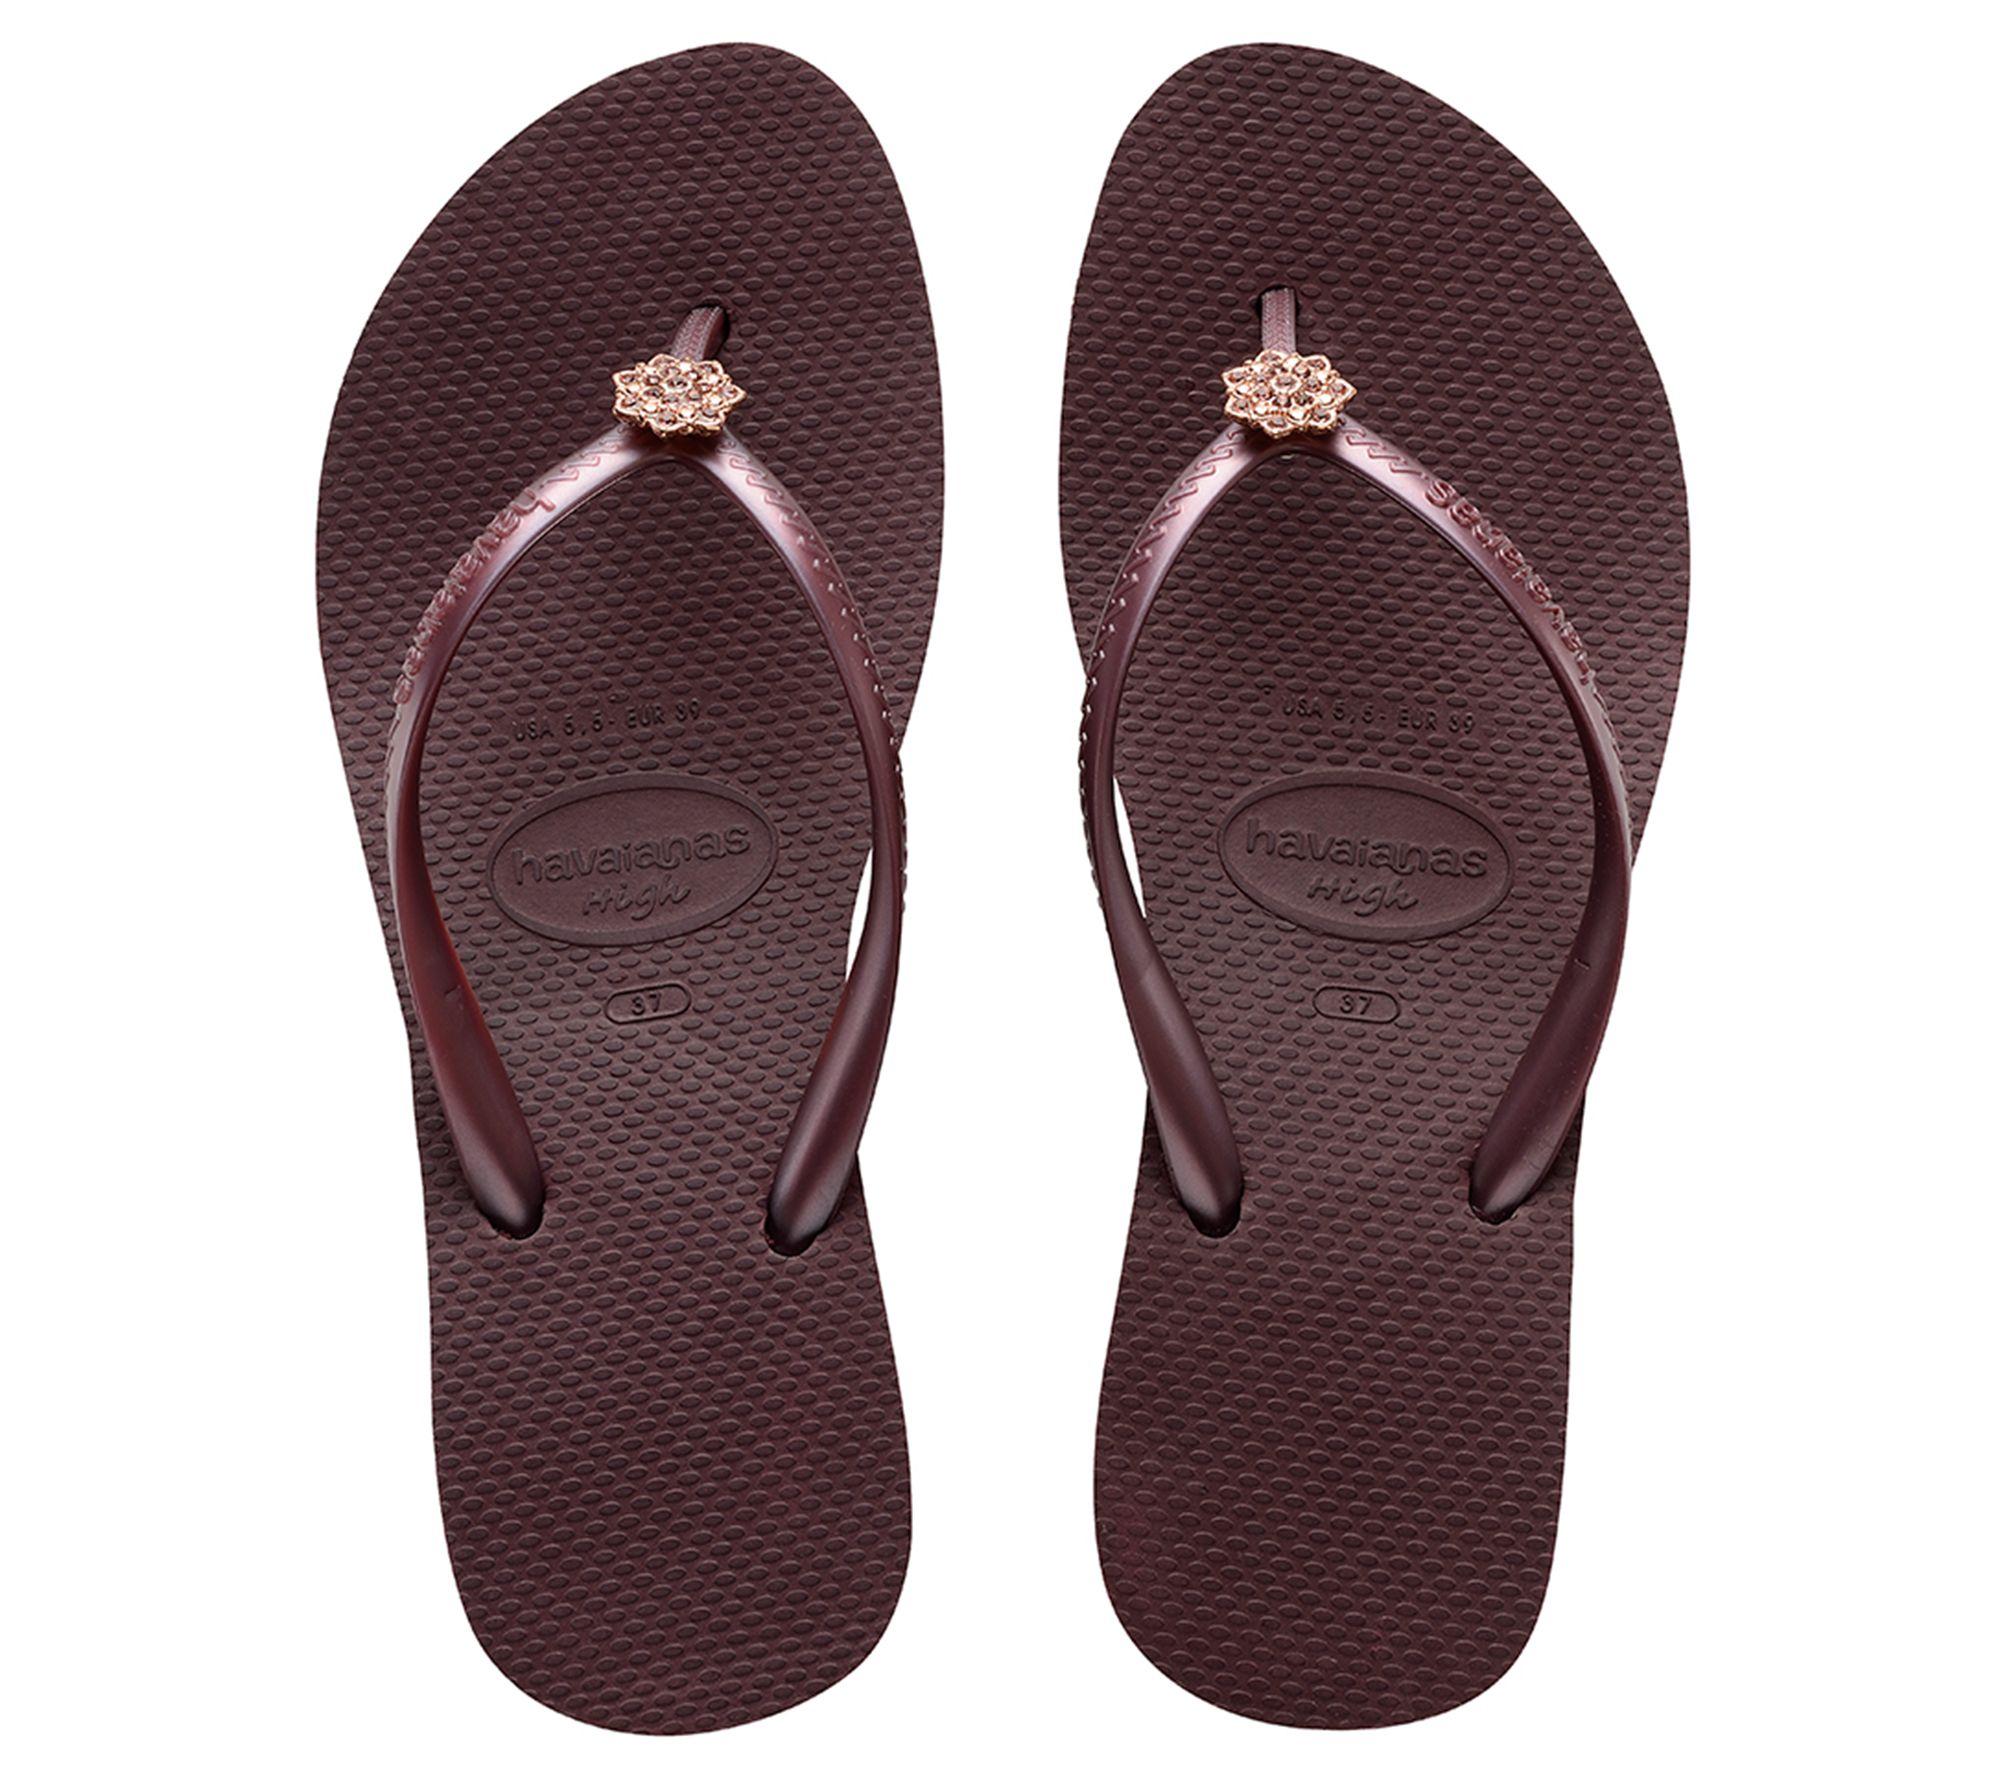 bd9b7c0959f Havaianas Flip Flop Wedge Sandals - High Fashion Poem — QVC.com